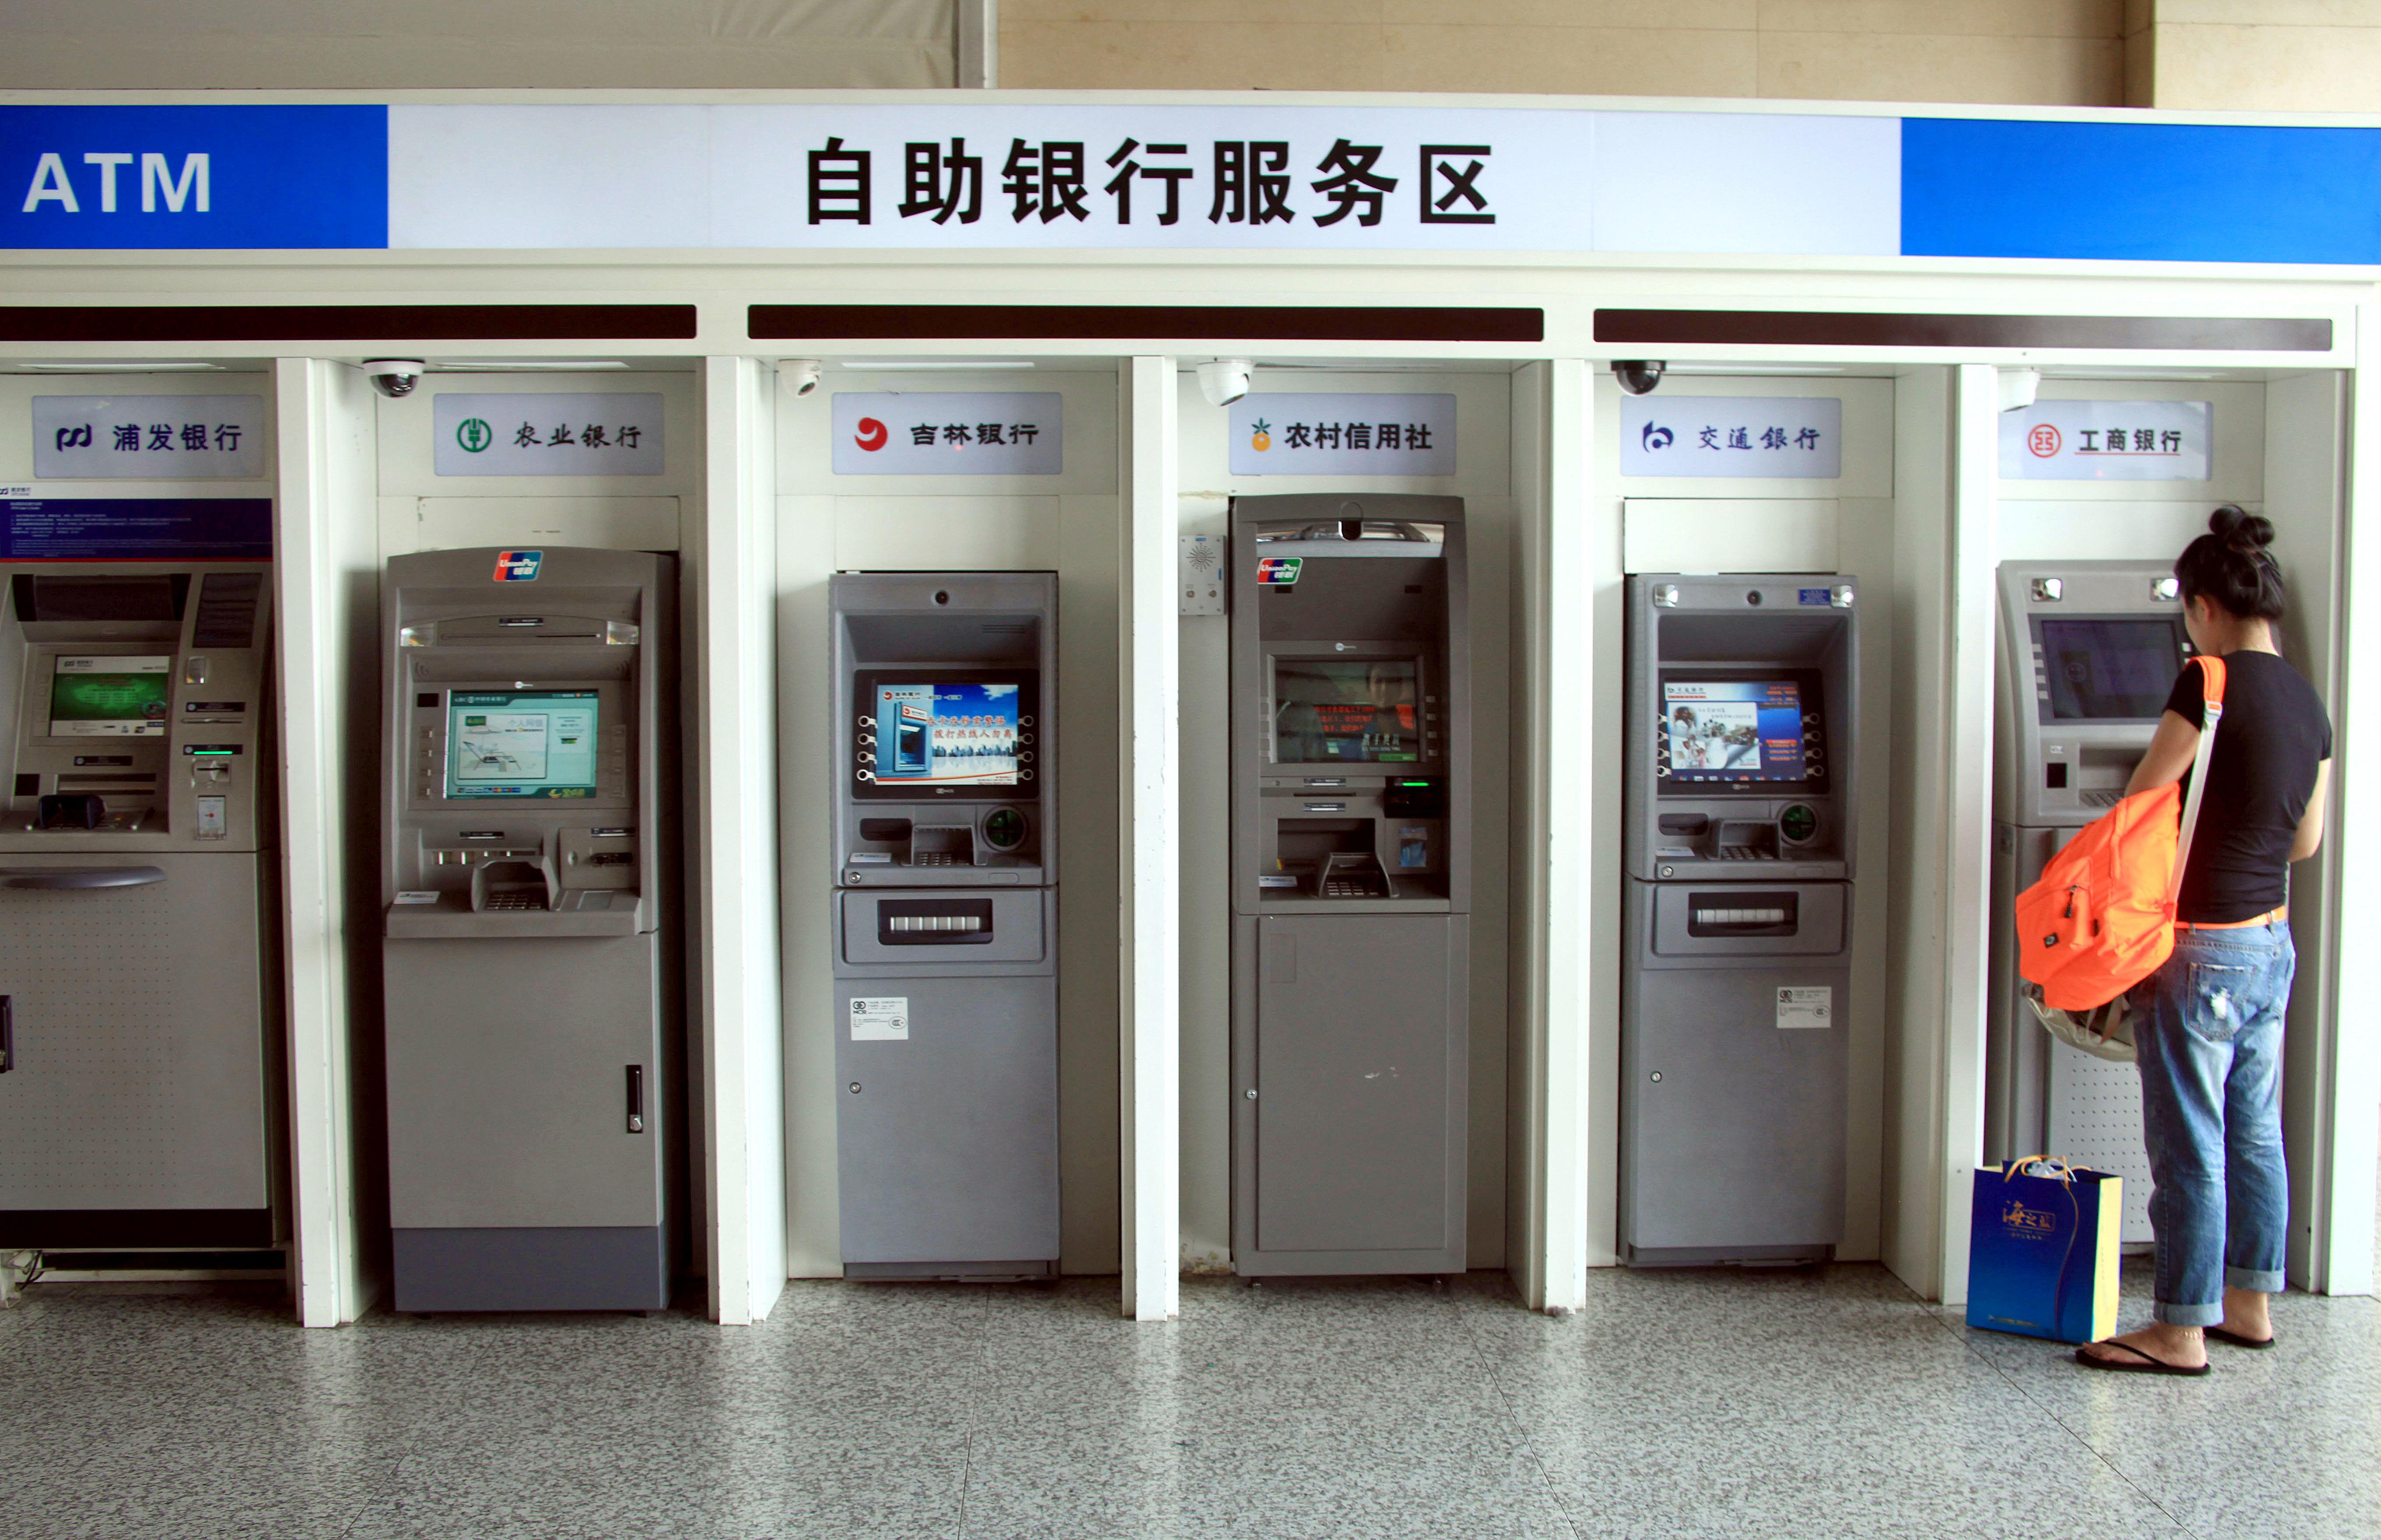 ATM机.jpg